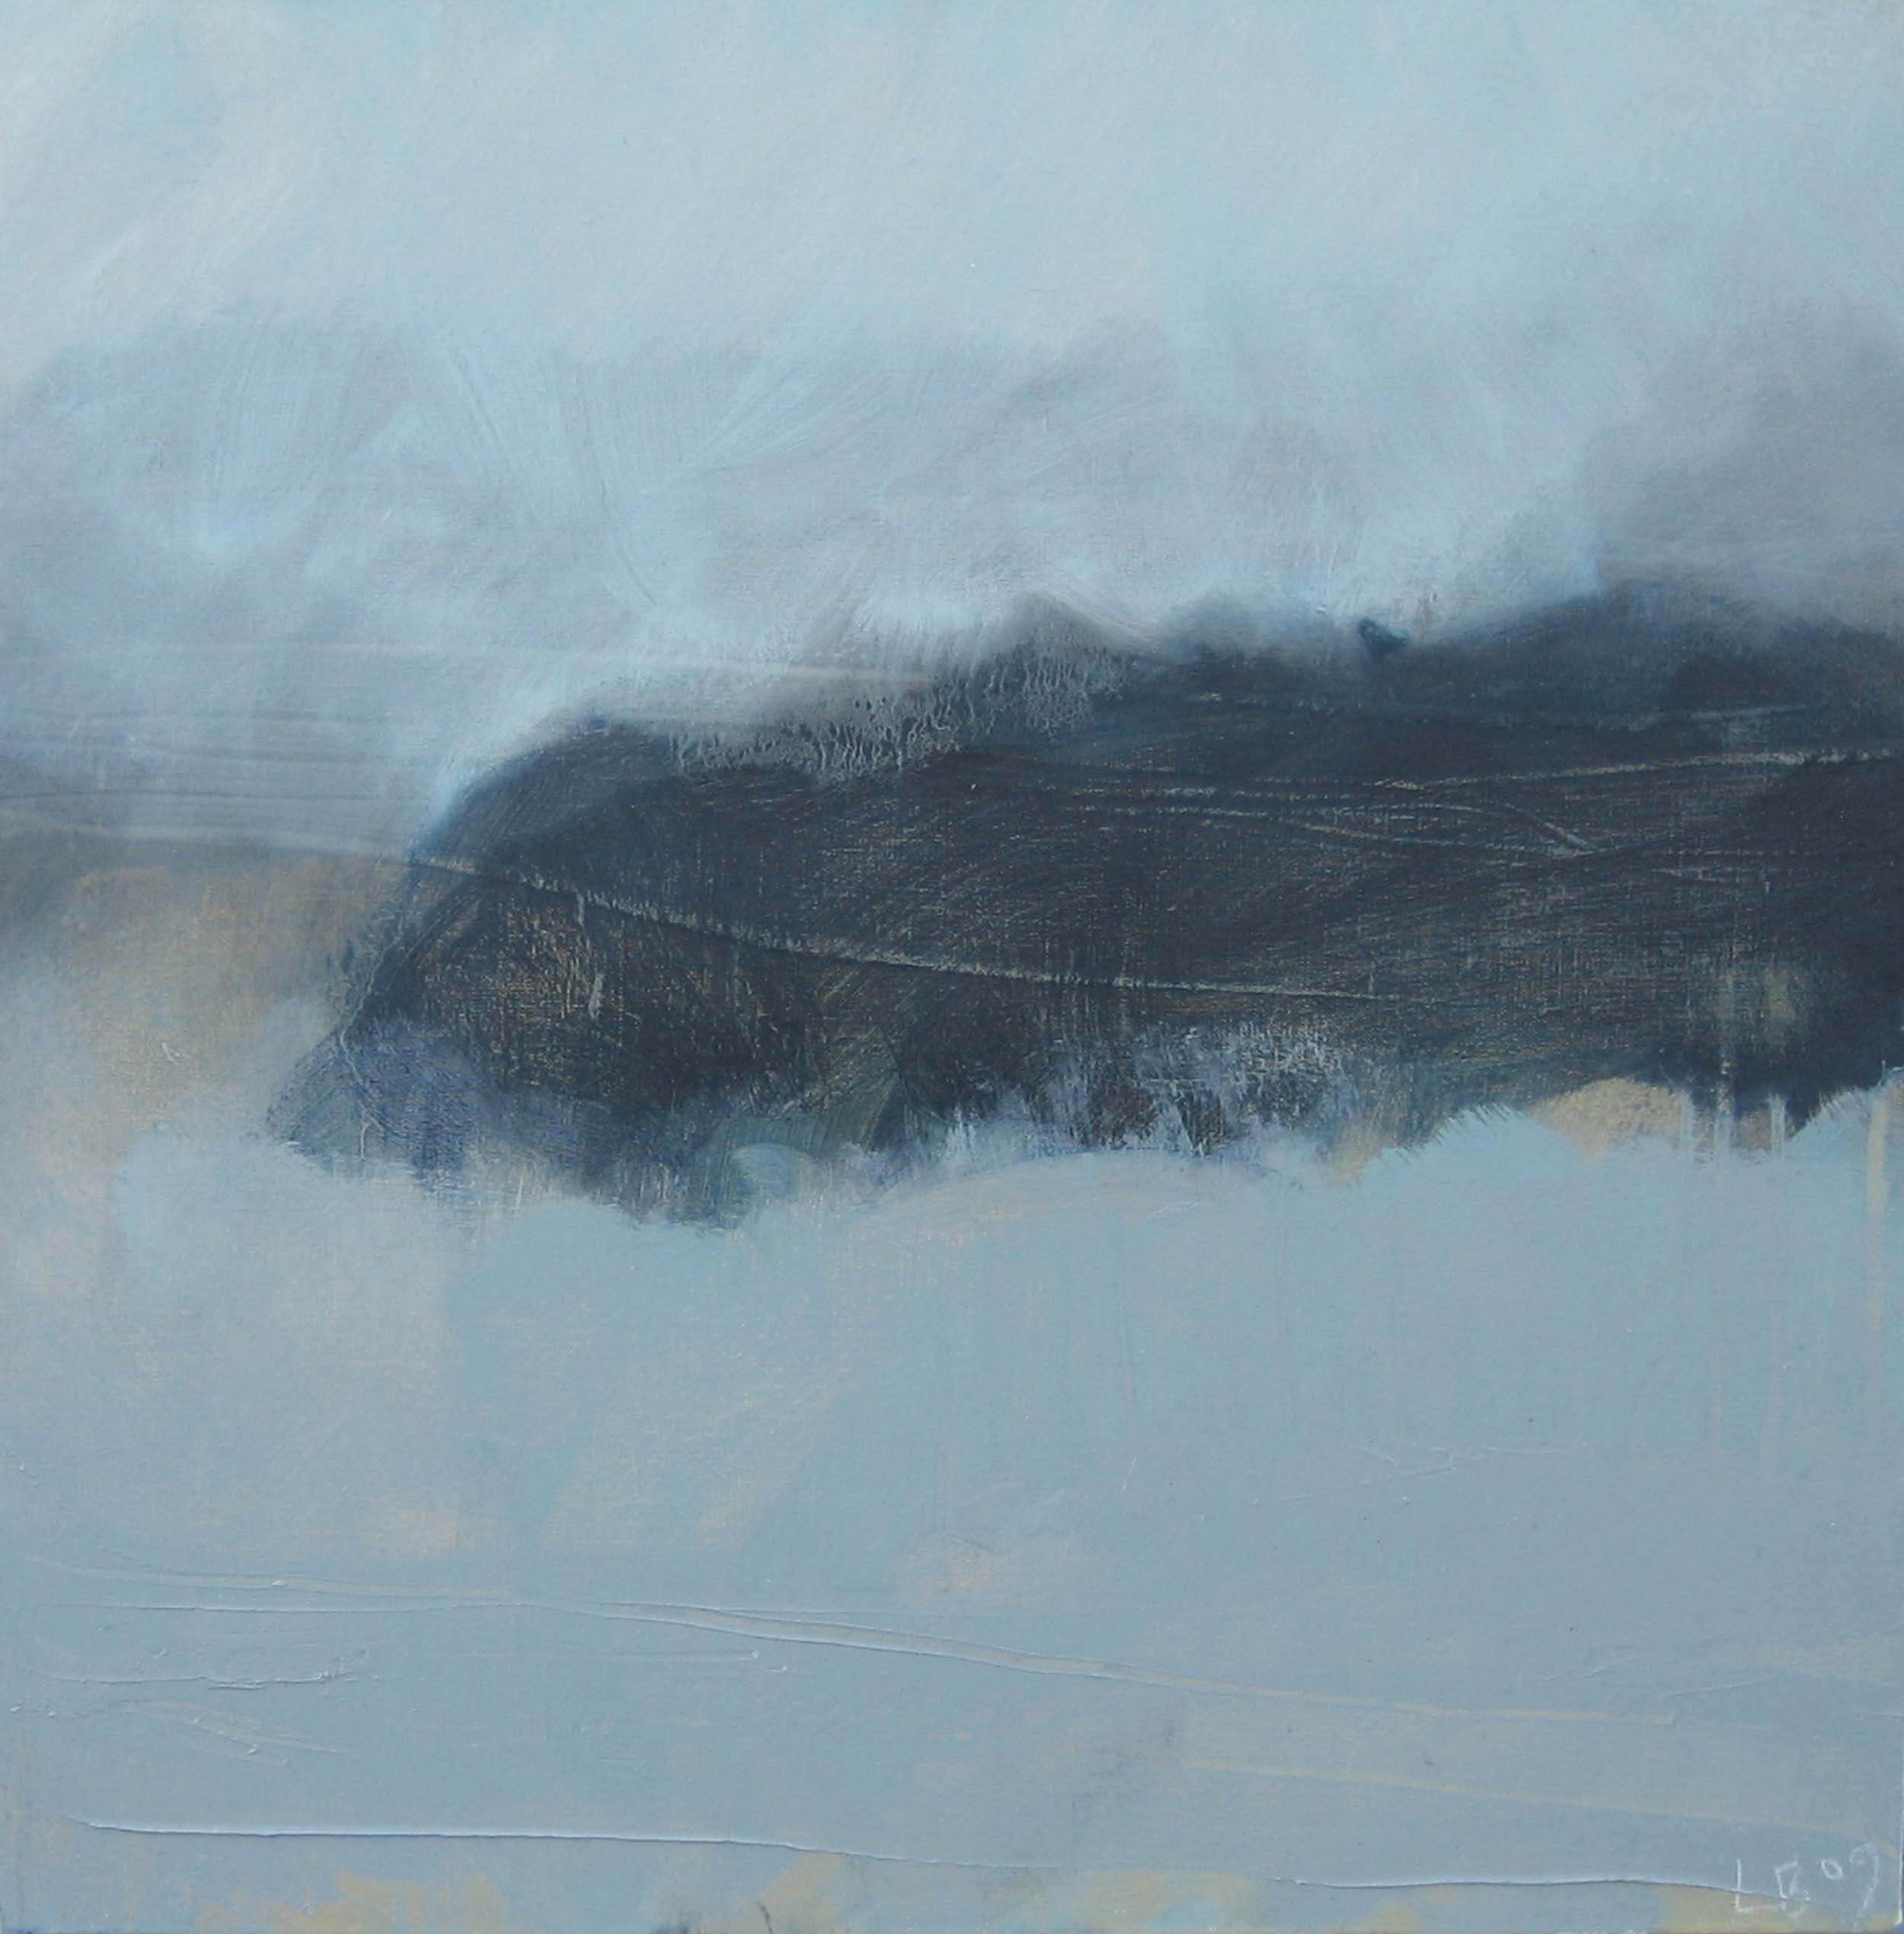 Leah Beggs 2009 - Frozen Headland - Oil on Canvas - 50 x 50cm_sml.jpg